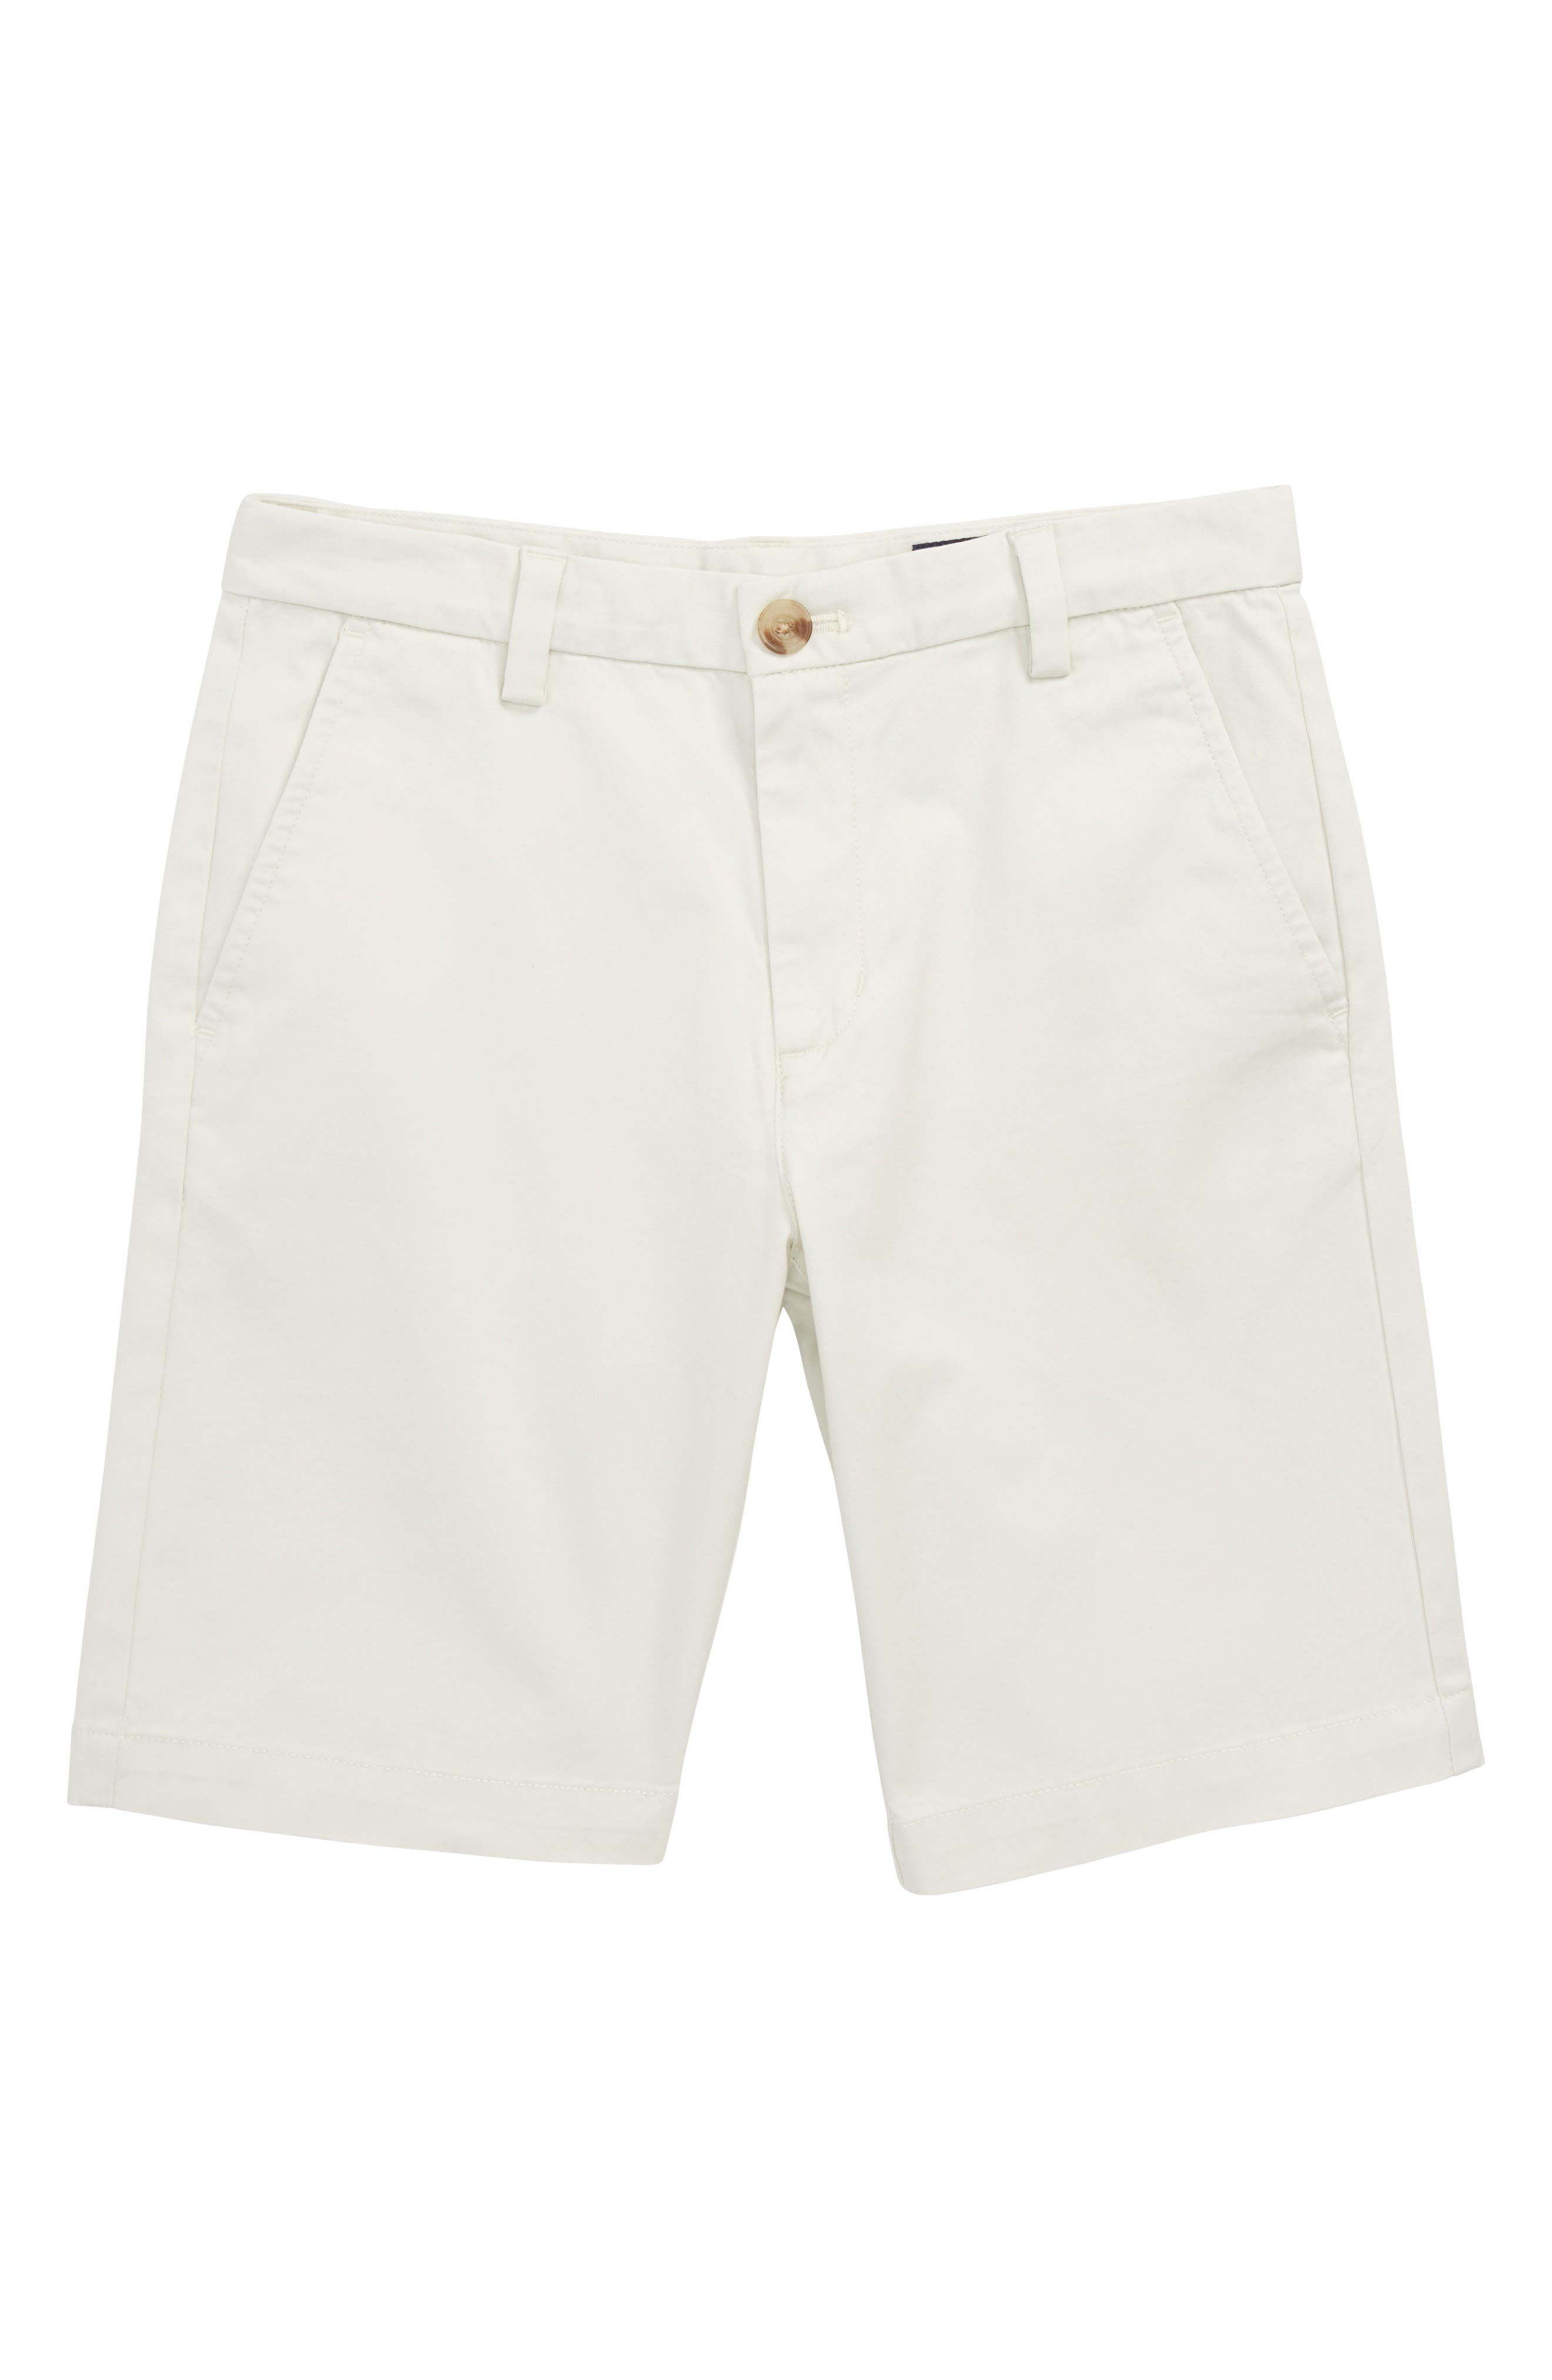 Stretch Breaker Shorts,                             Main thumbnail 1, color,                             STONE